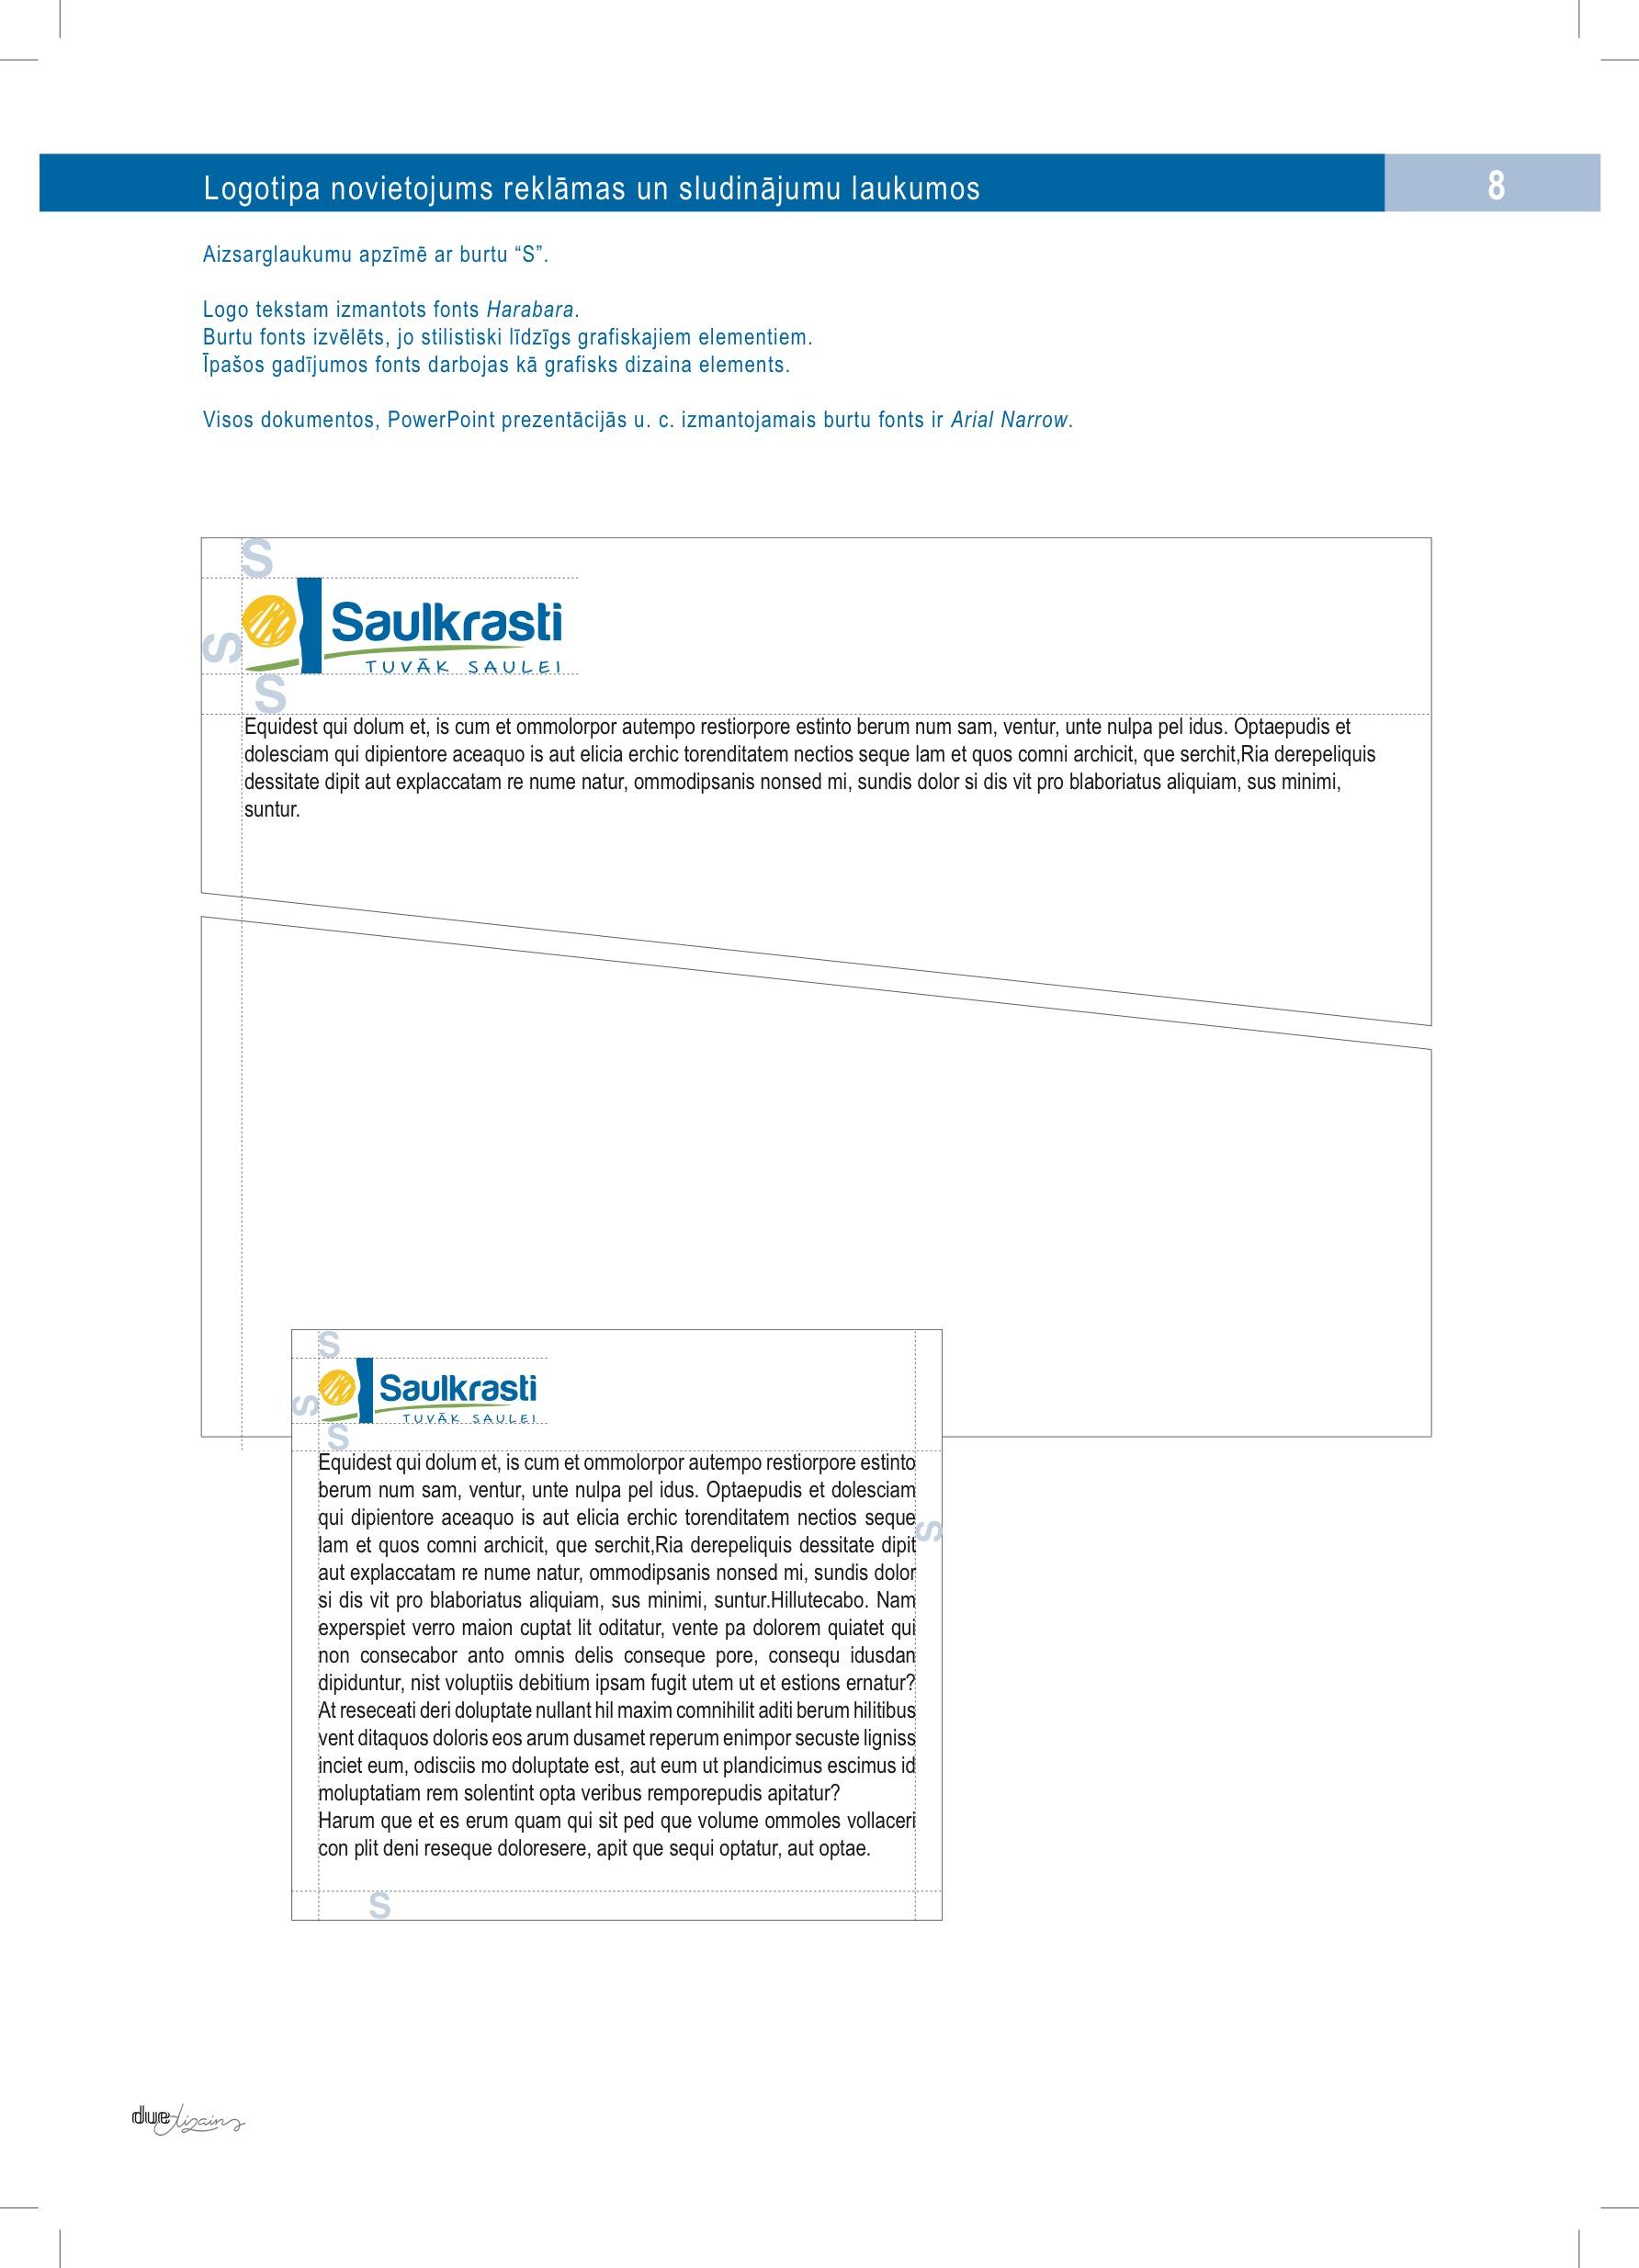 saulkrasti-print 10